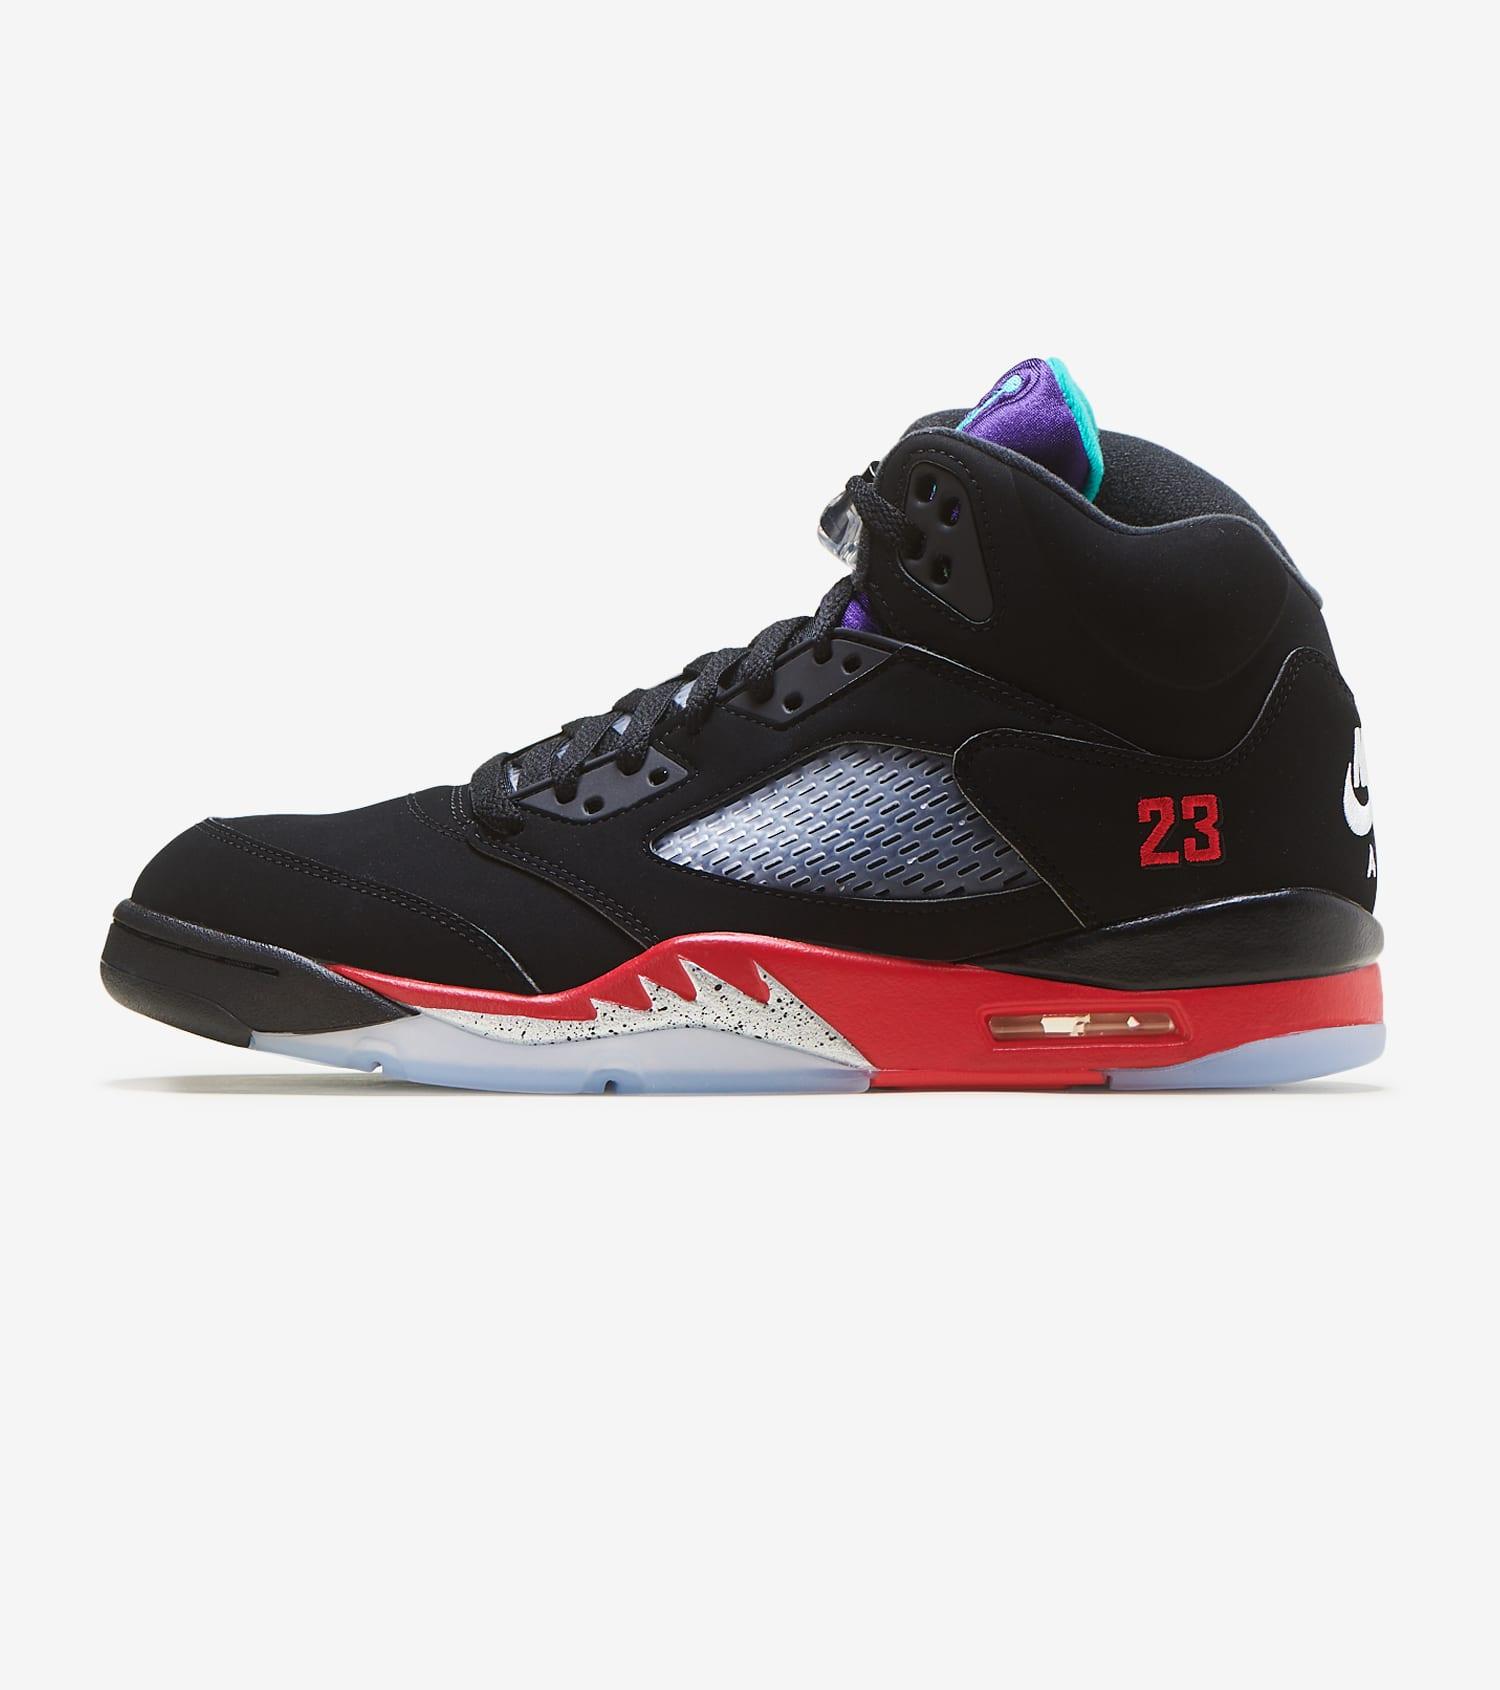 Air Jordan 5 Retro Top 3 Shoes | Jimmy Jazz